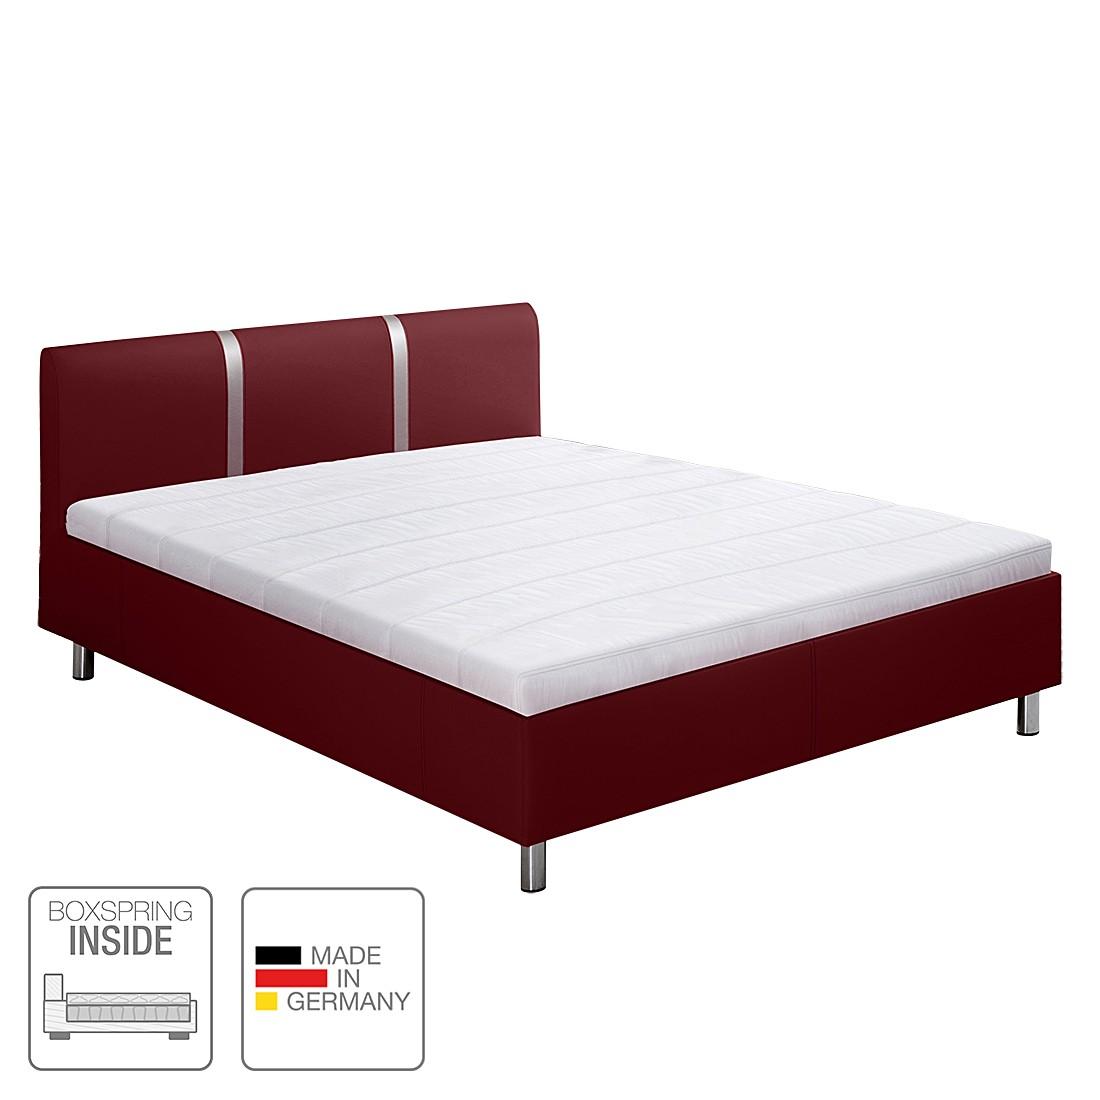 Boxspring-Inside-Bett Caya - Kunstleder - 180 x 200cm - H3 ab 80 kg - Tonnentaschenfederkernmatratze - starrer Lattenrost mit 19 Federholzleisten - Rot, Nova Dream Sleepline